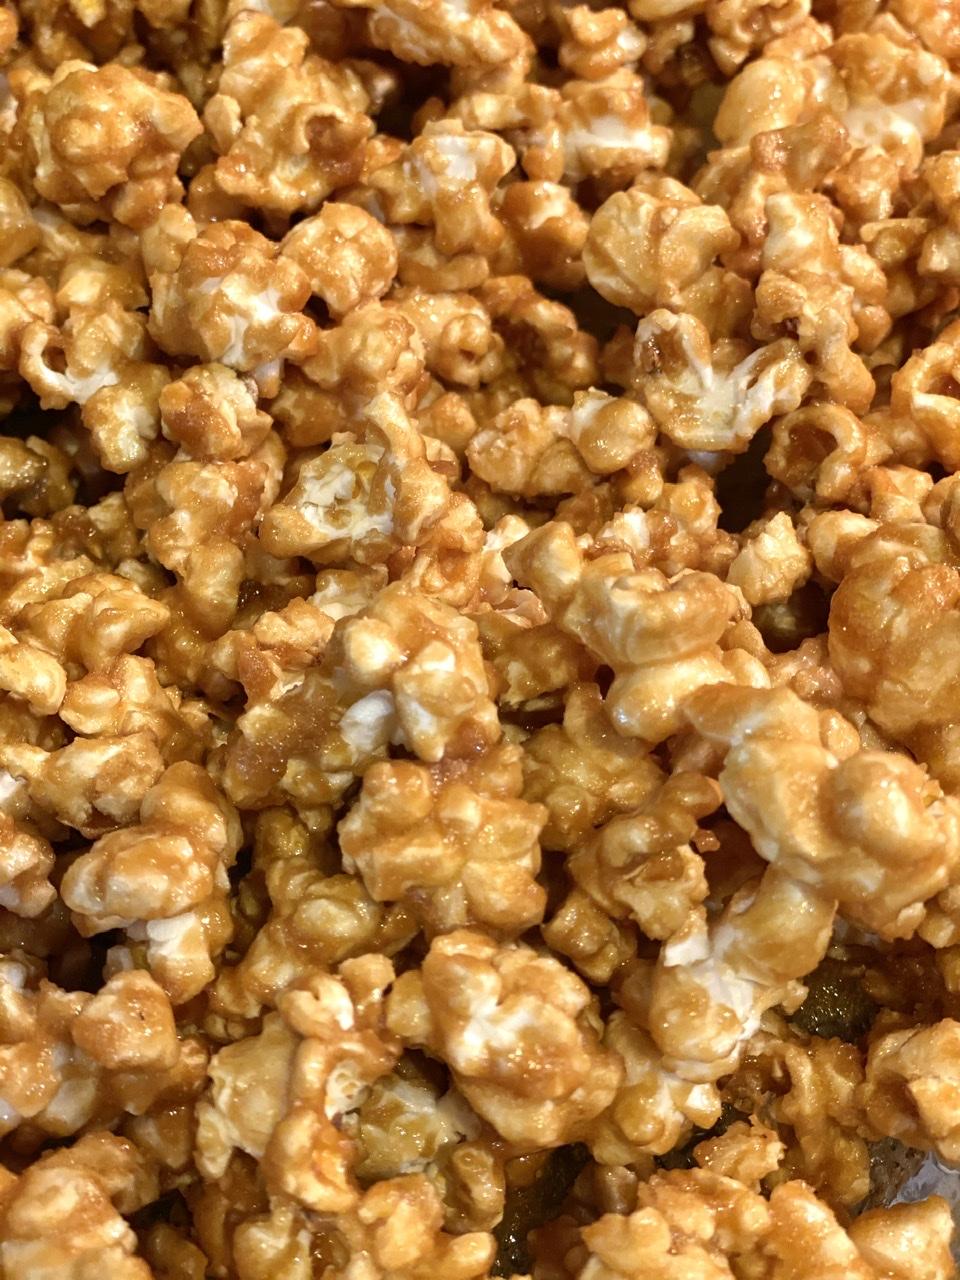 Caramel Popcorn Stella Marie Wingo